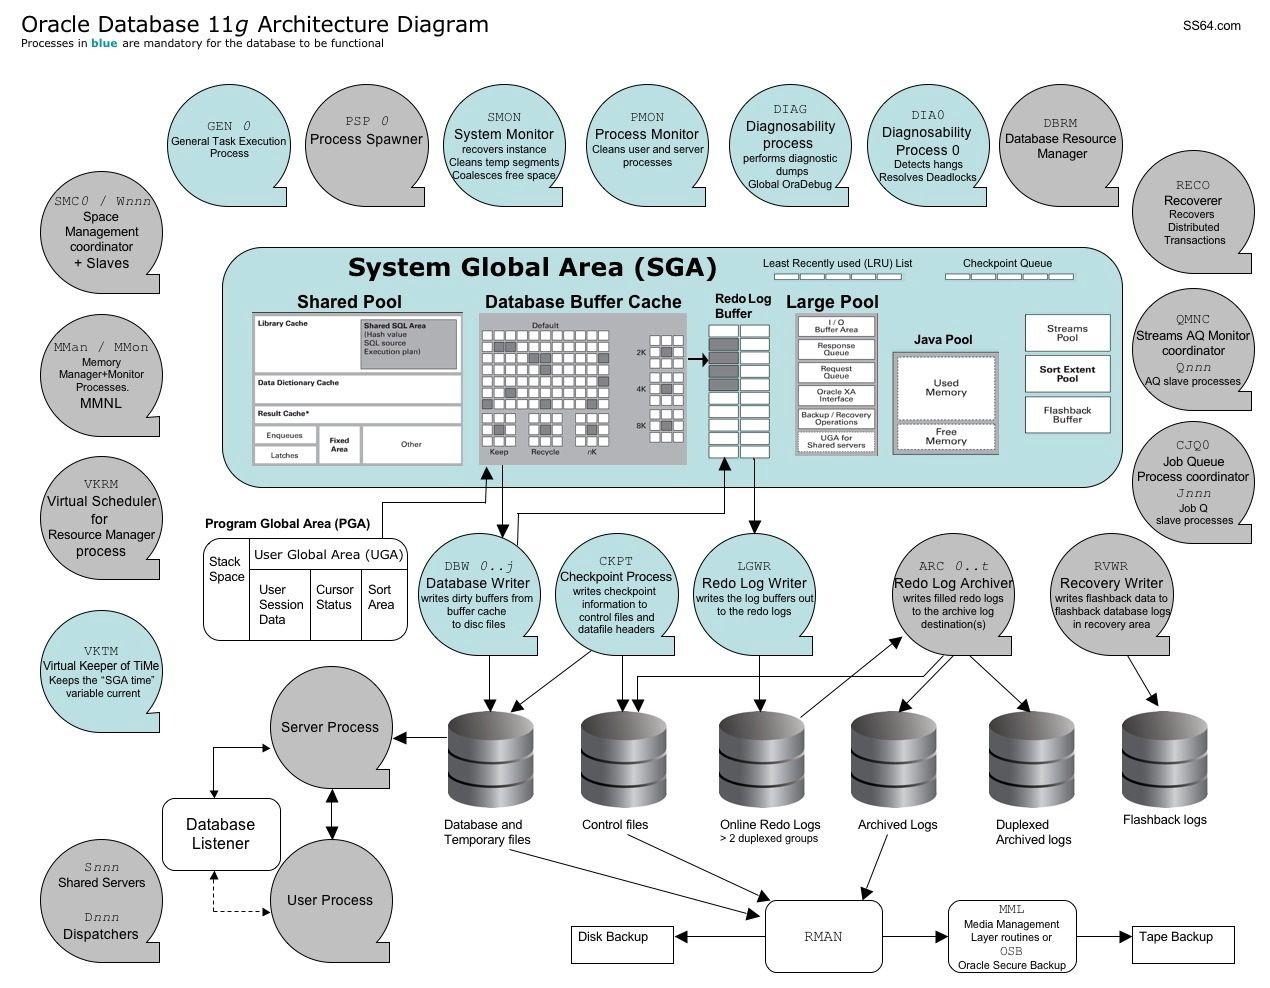 Oracle 11g Architecture Diagram Oracle Diagram Architecture Oracle Database Architecture